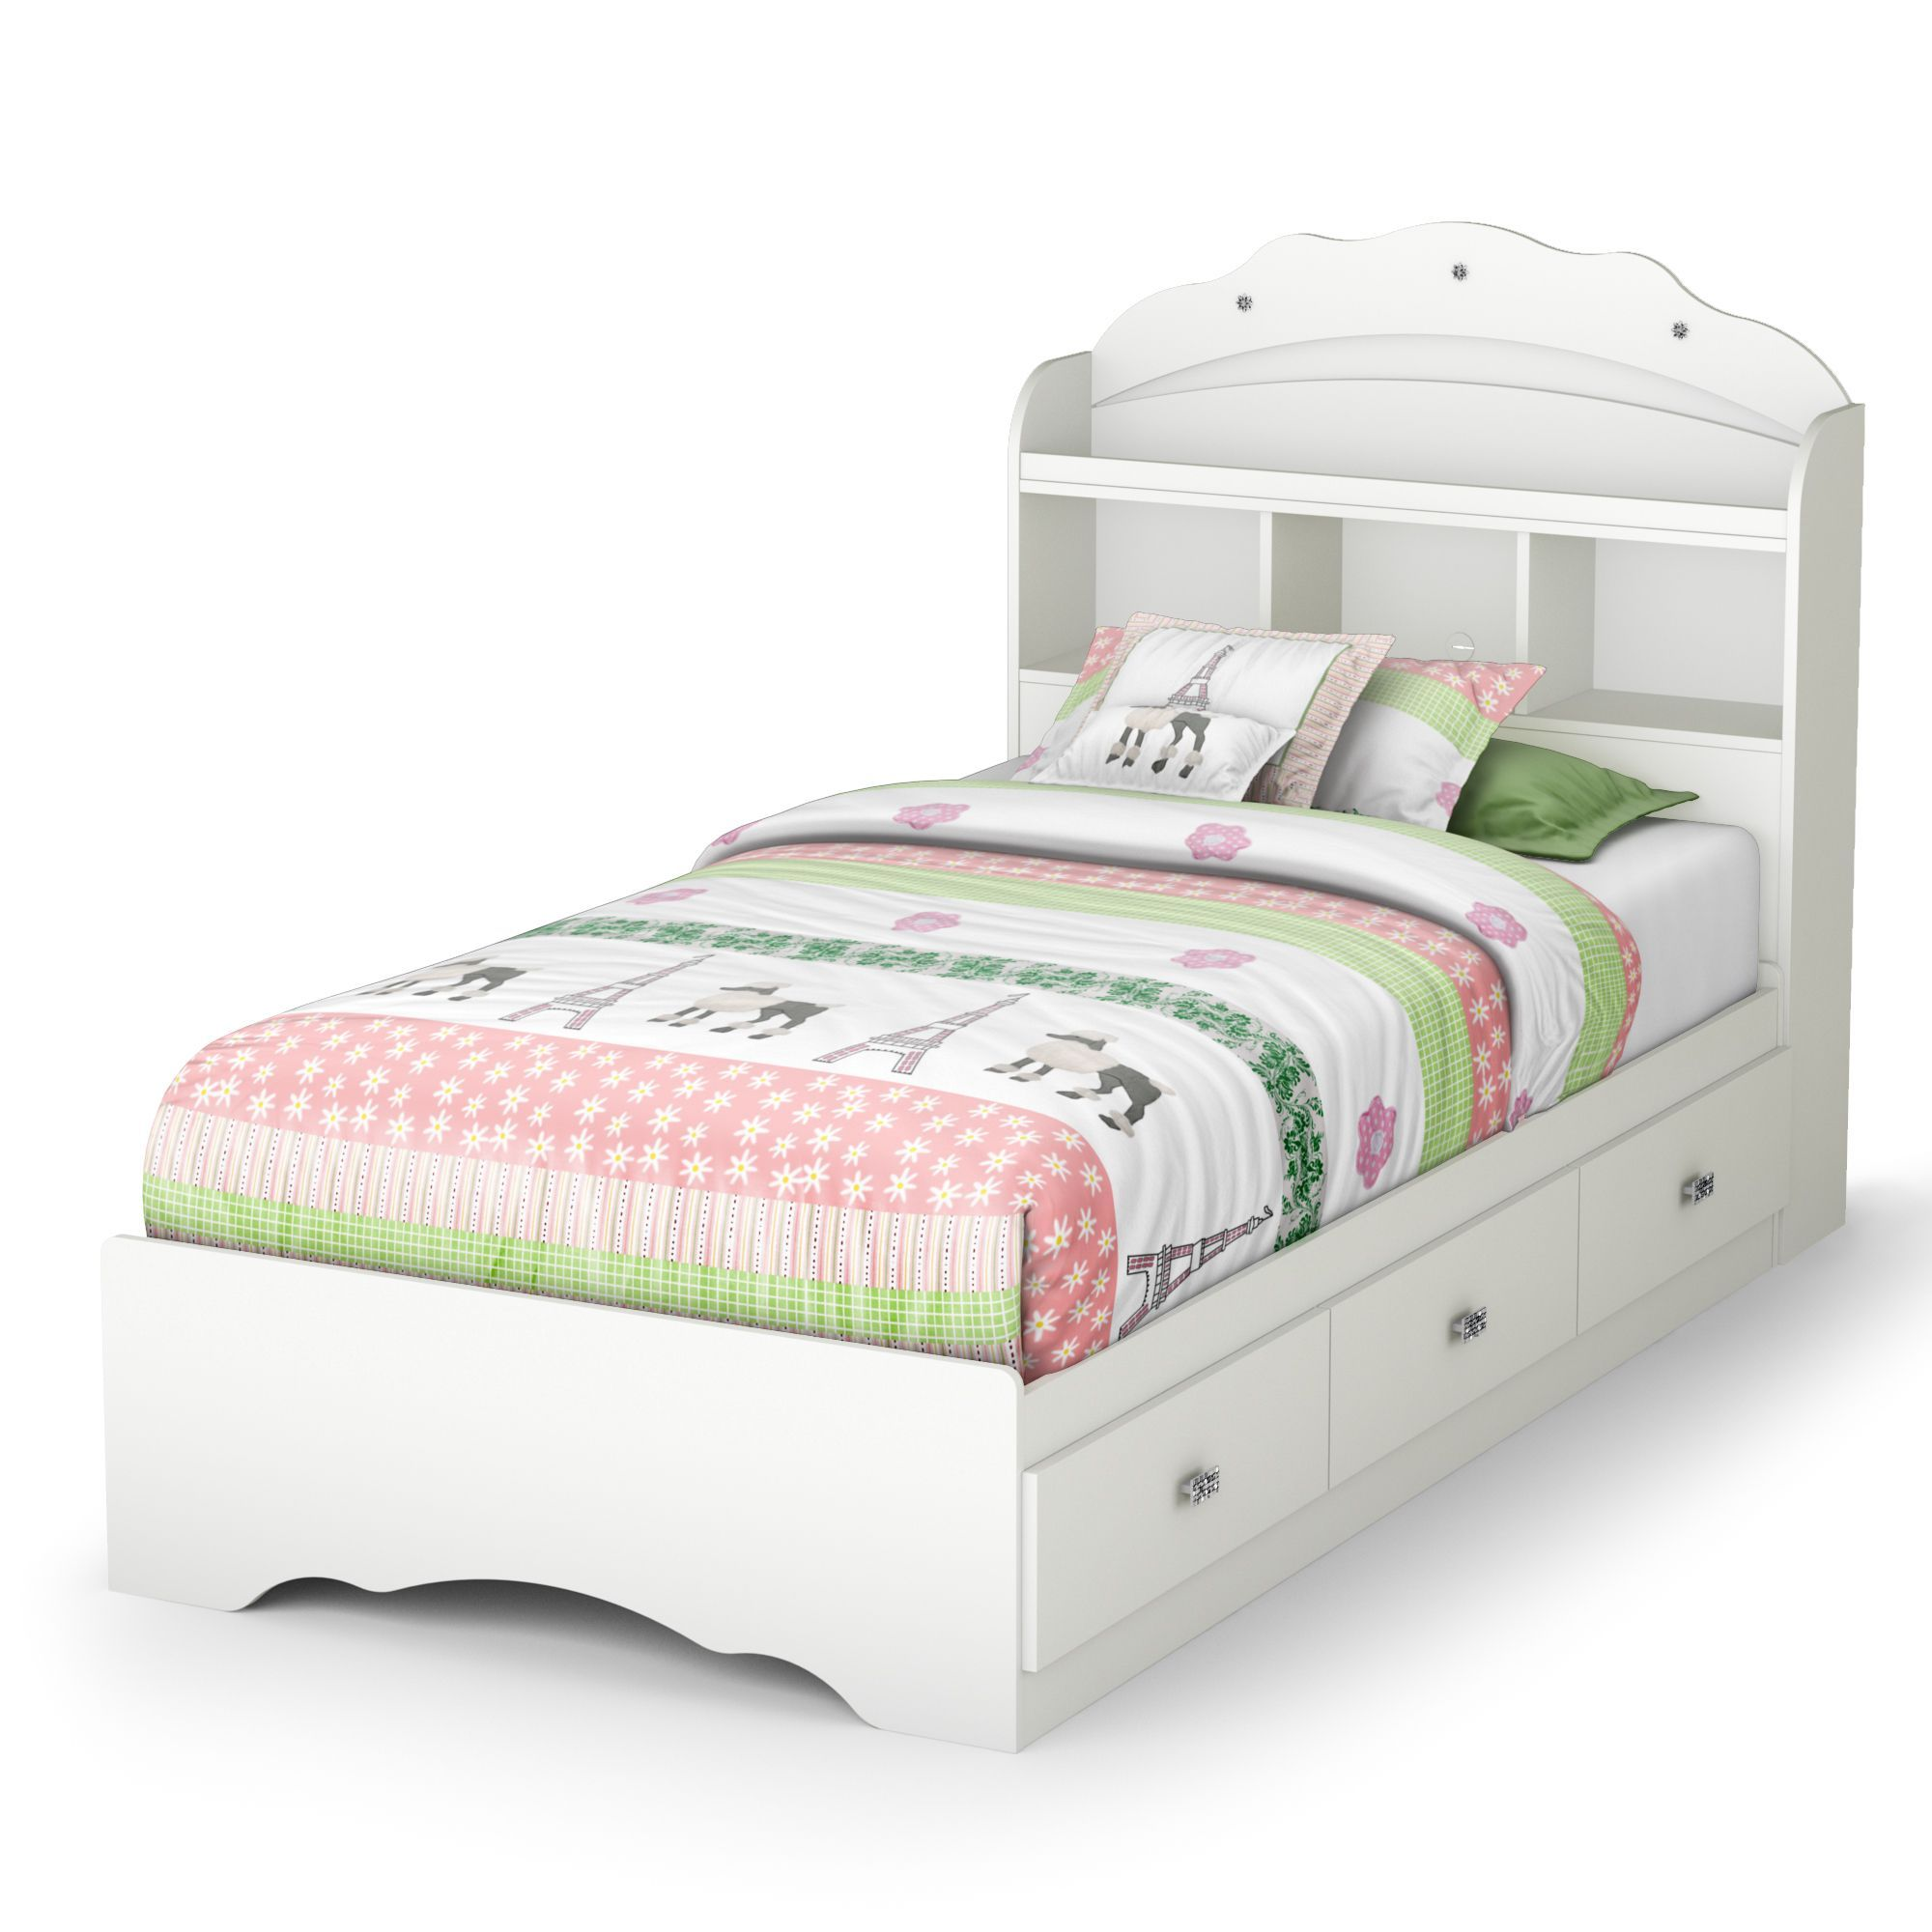 Medium Of Twin Bed Headboards